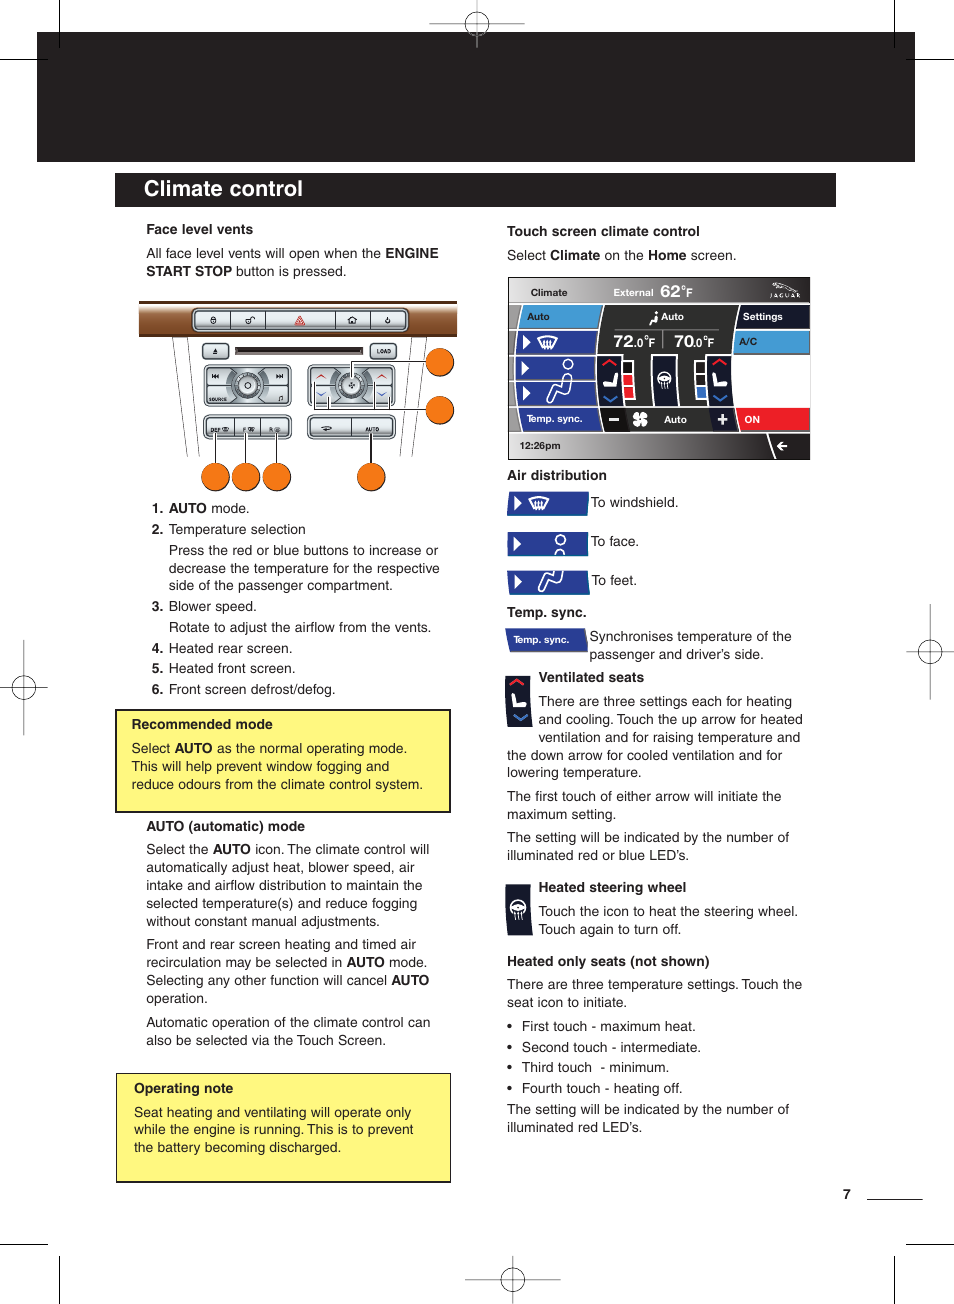 Climate control   Jaguar XF User Manual   Page 7 / 20